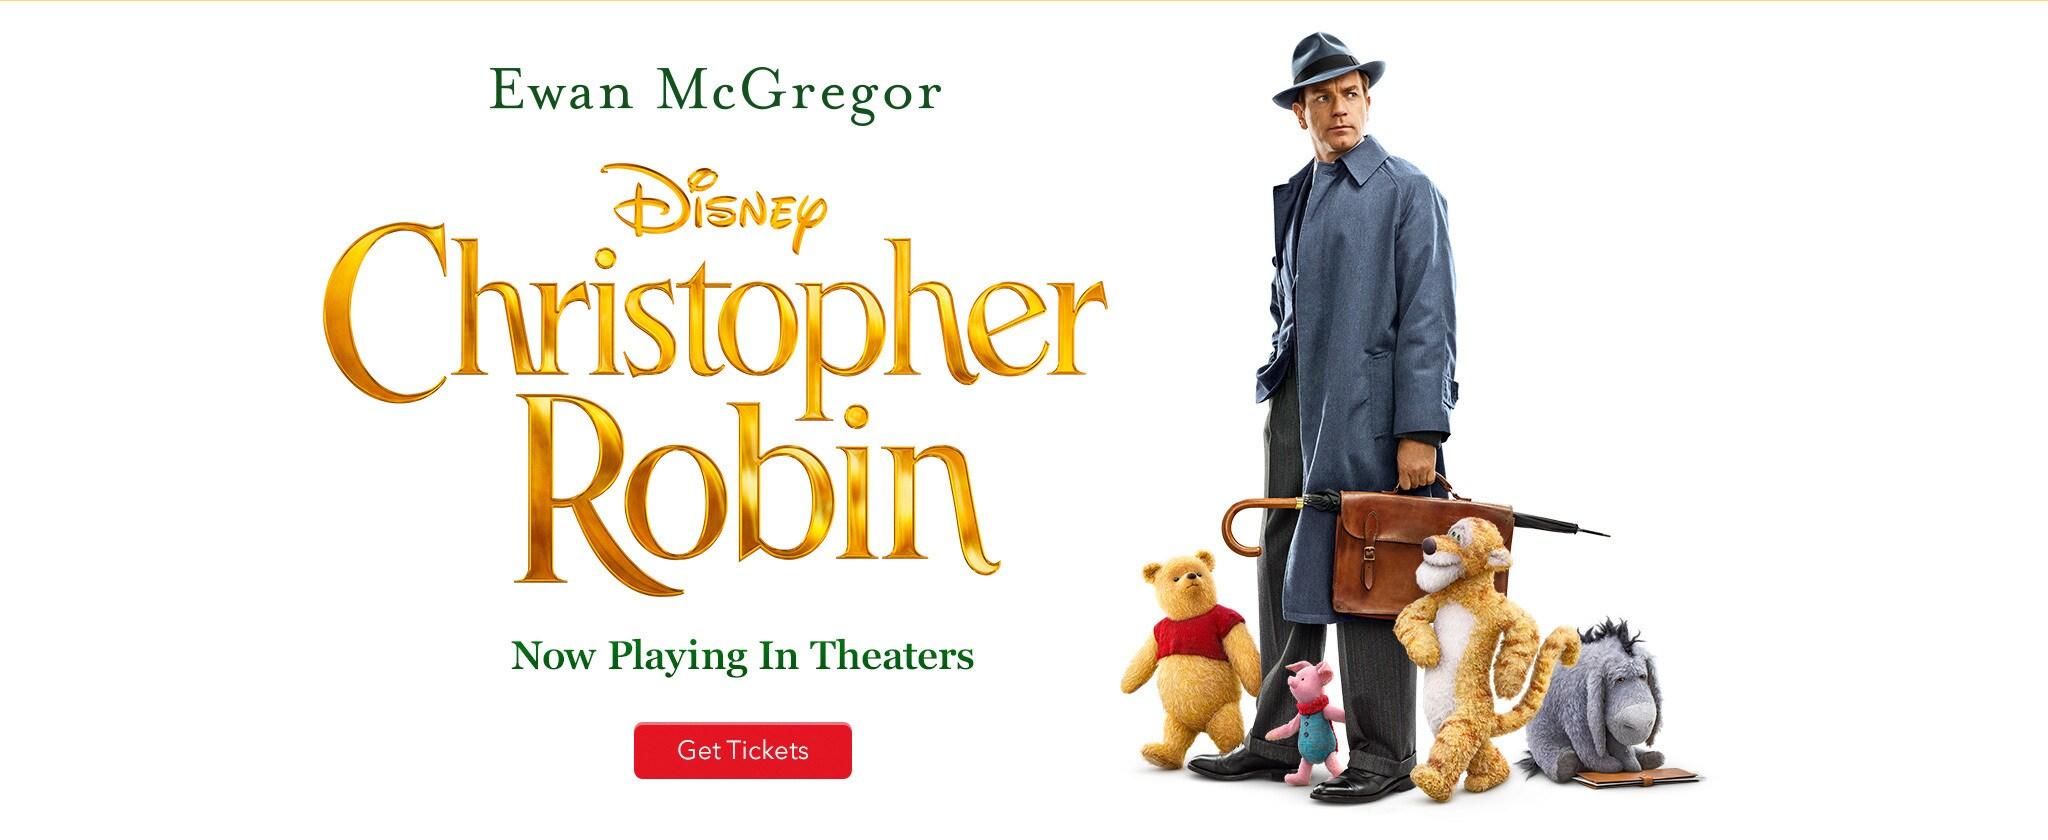 Ewen Mcgregor Inchristopher Robin No Playing In Theatres Get Tickets